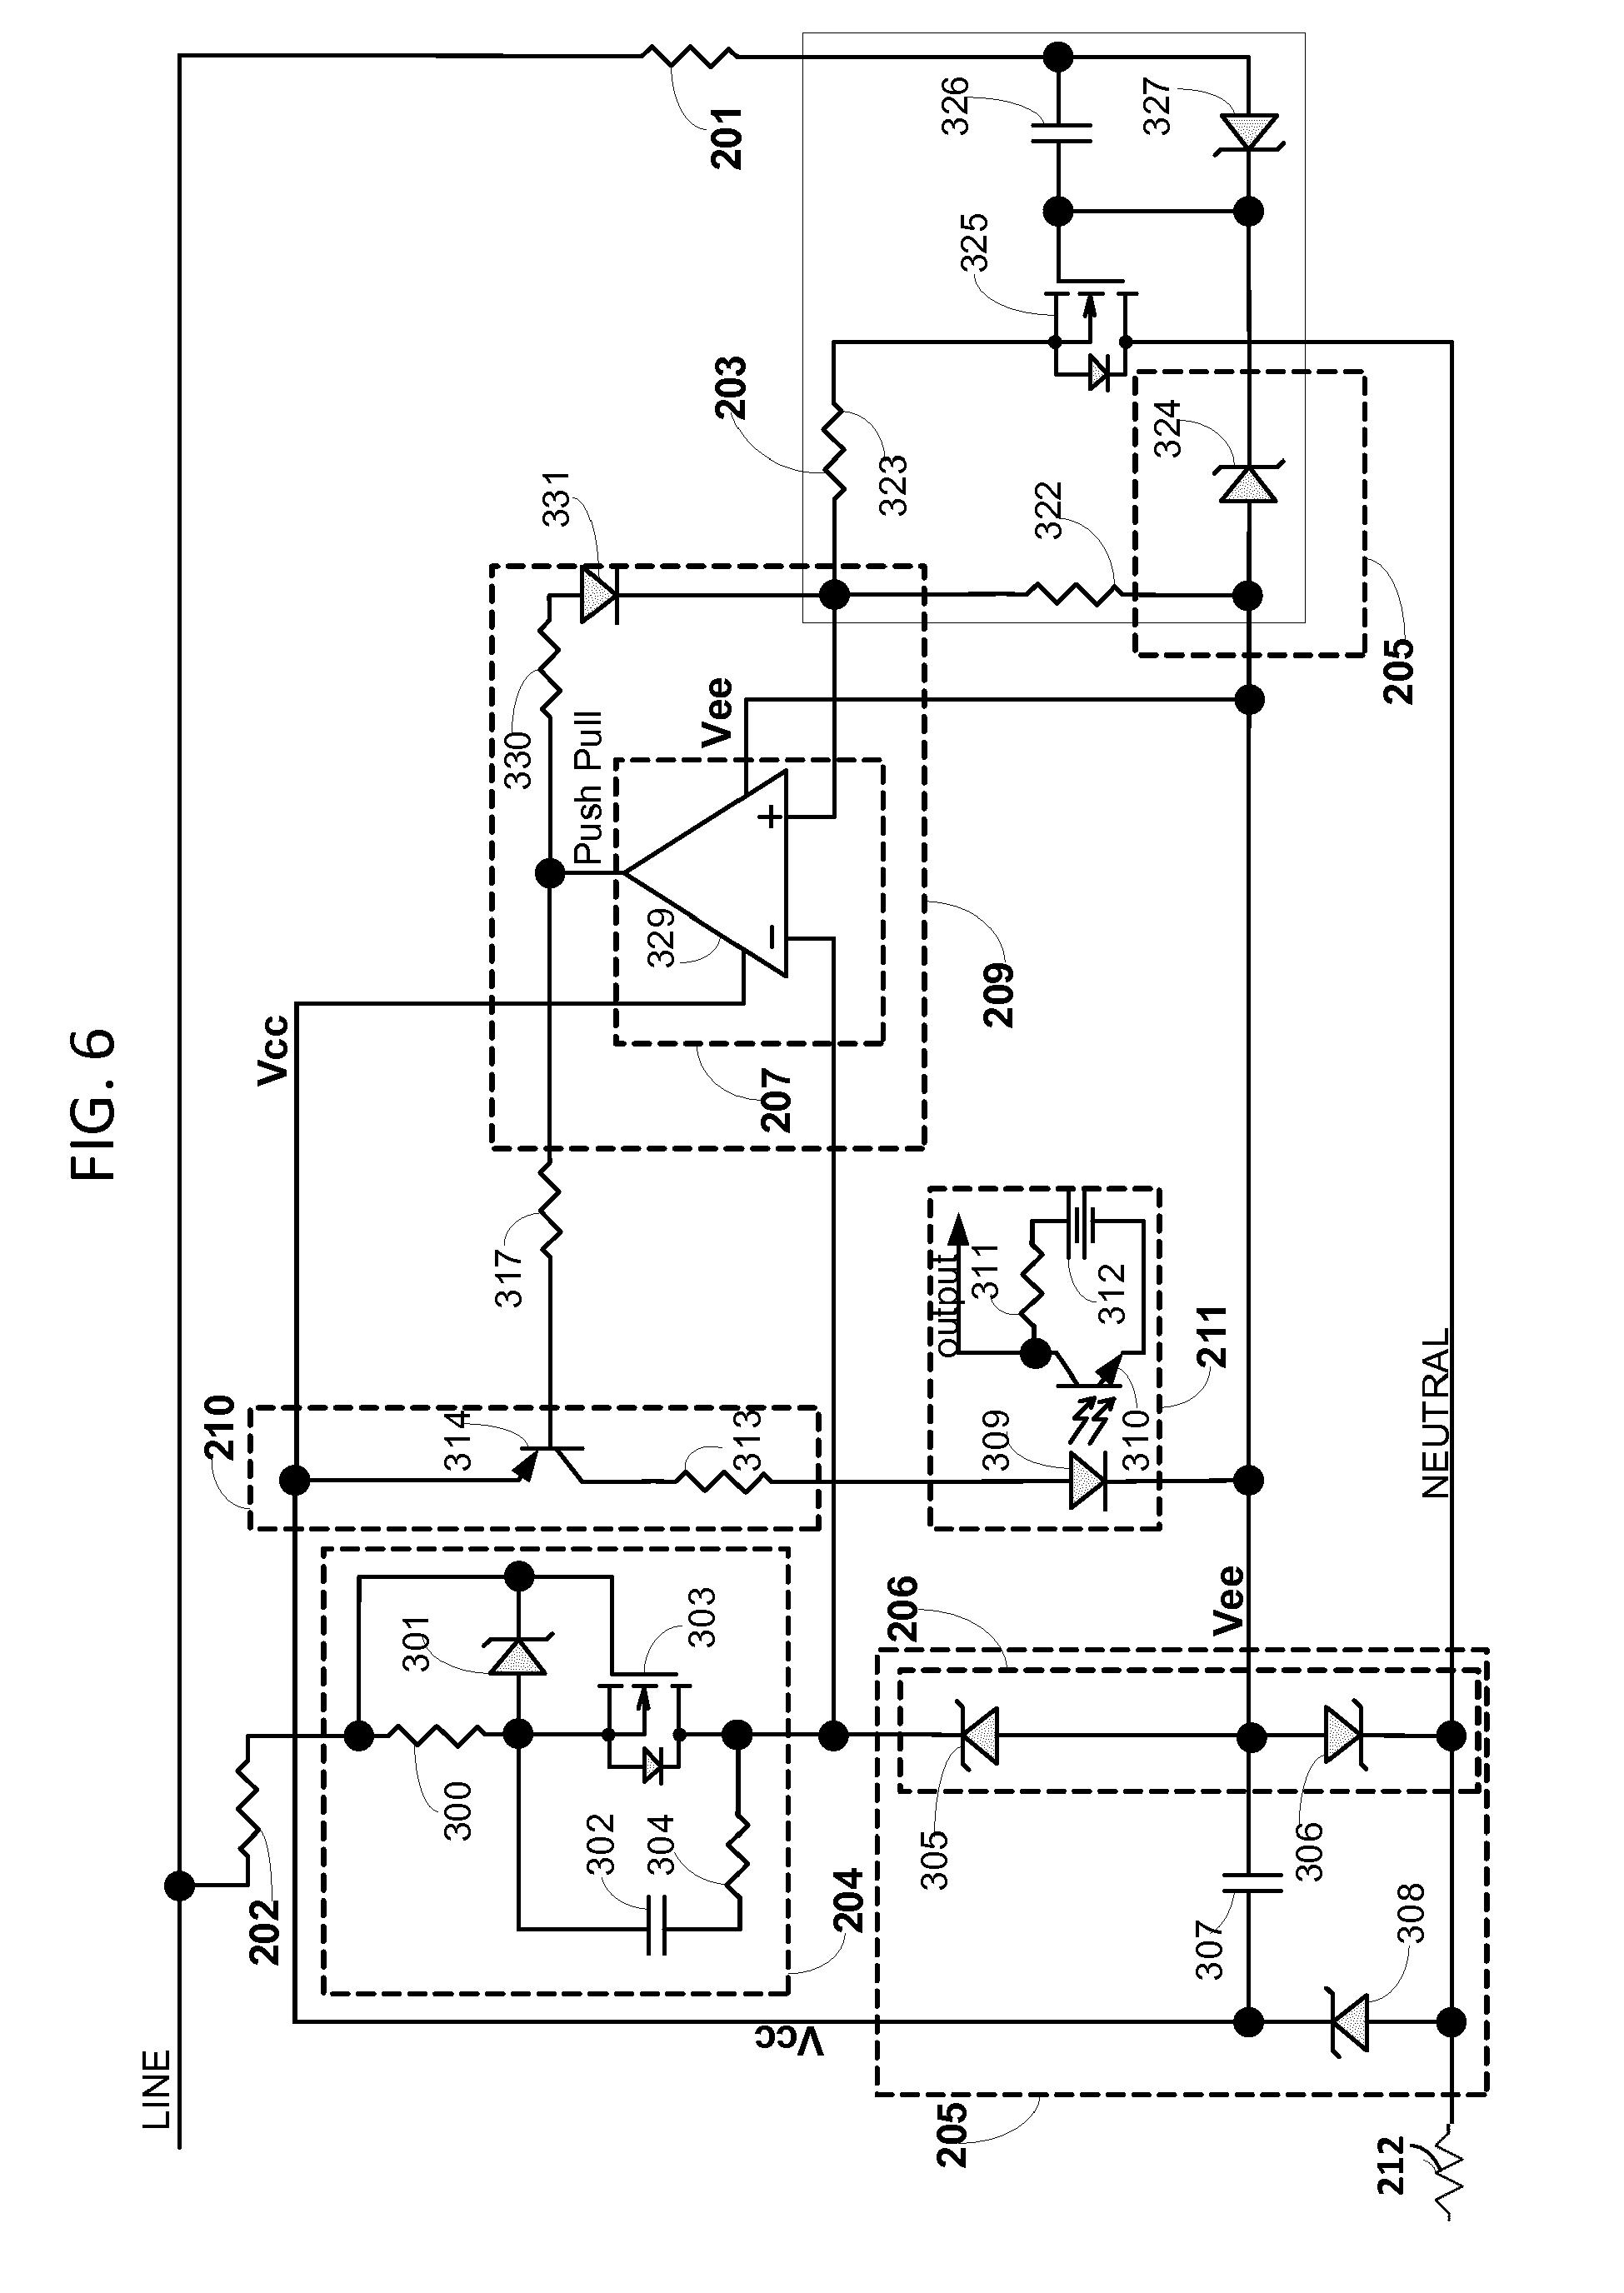 patent ep2728751a2